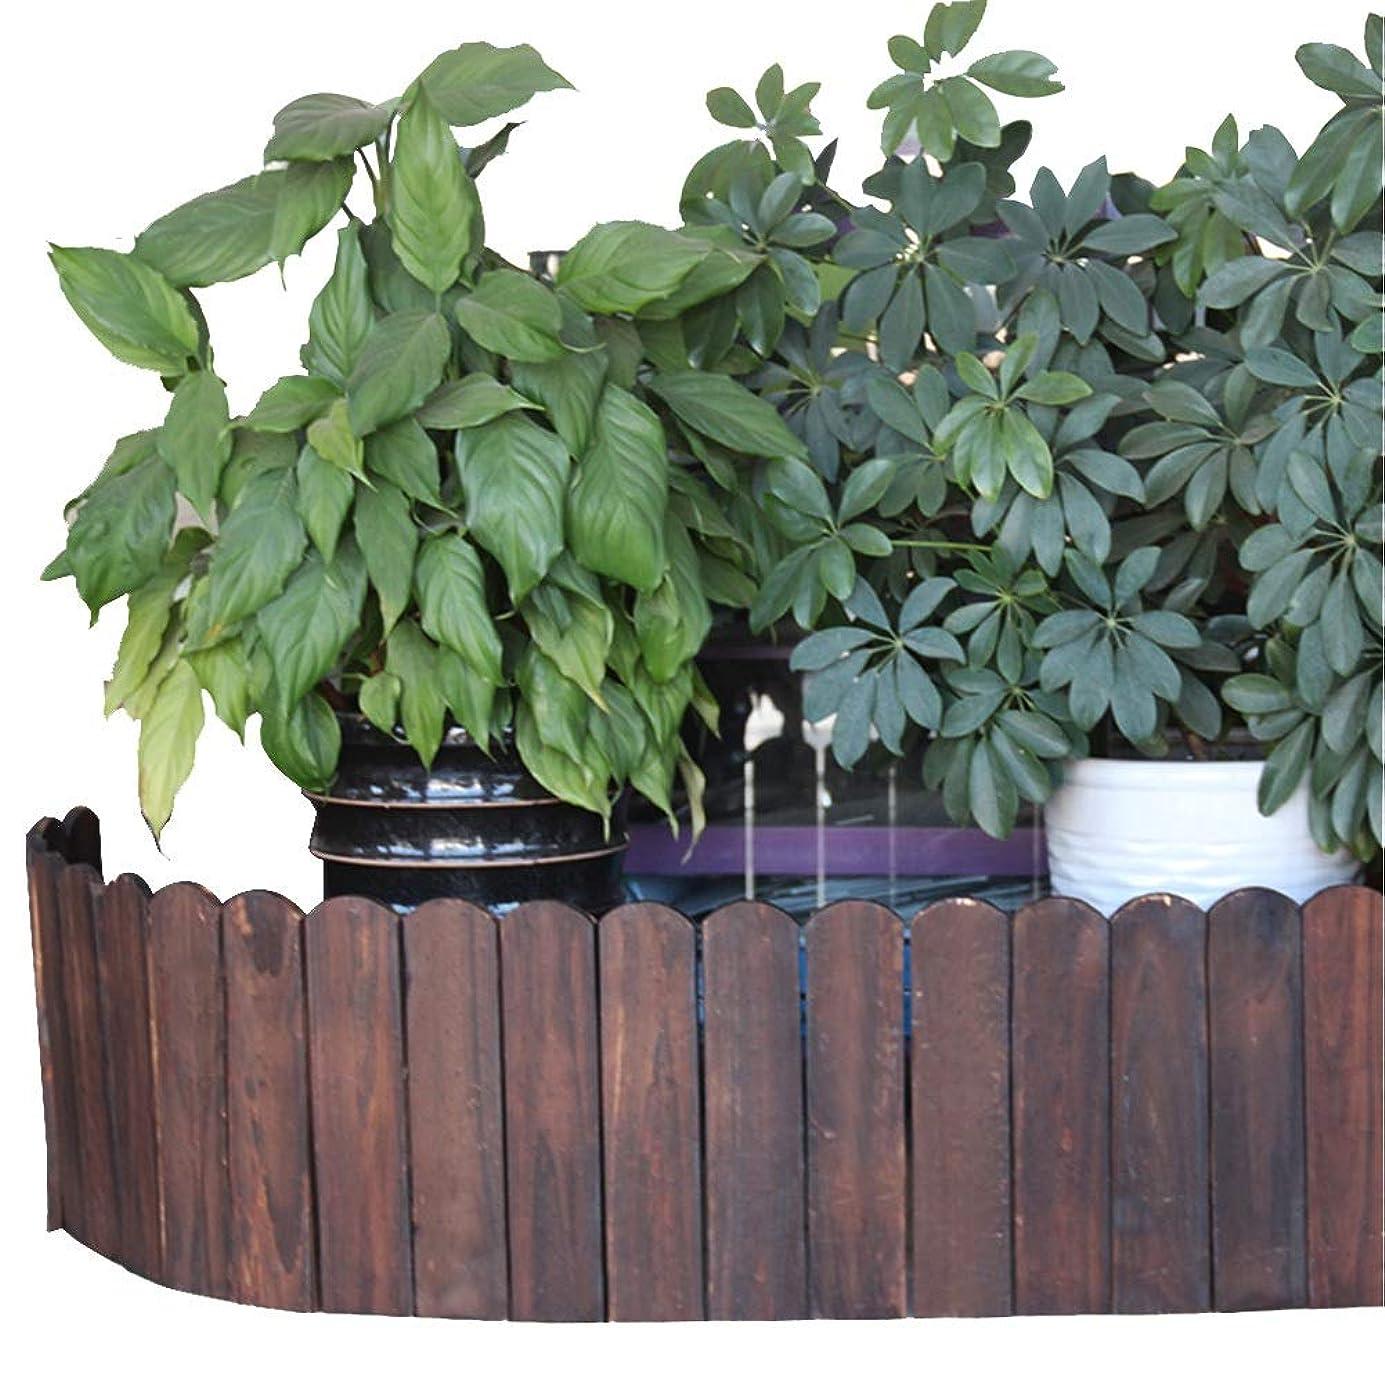 YYFANG 木製フェンス耐候性のある含浸の庭の装飾の木の塀の高温炭化の植物保護、5サイズ (Color : Brown, Size : 100x50cm)